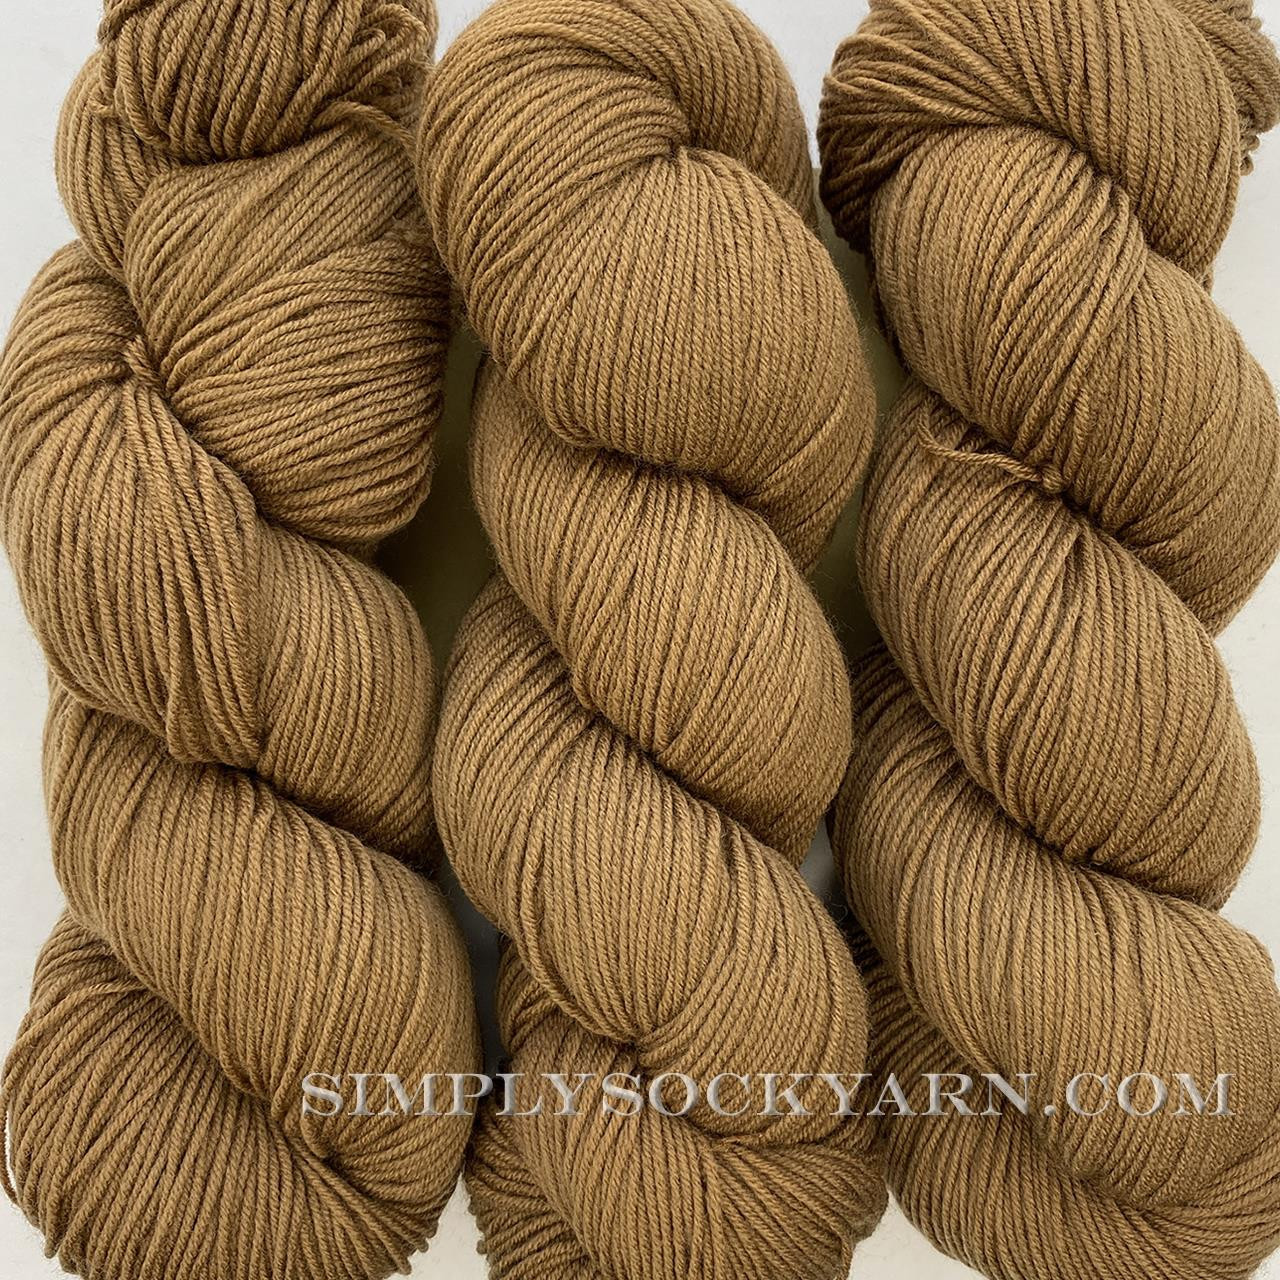 Urth Harvest Walnut -